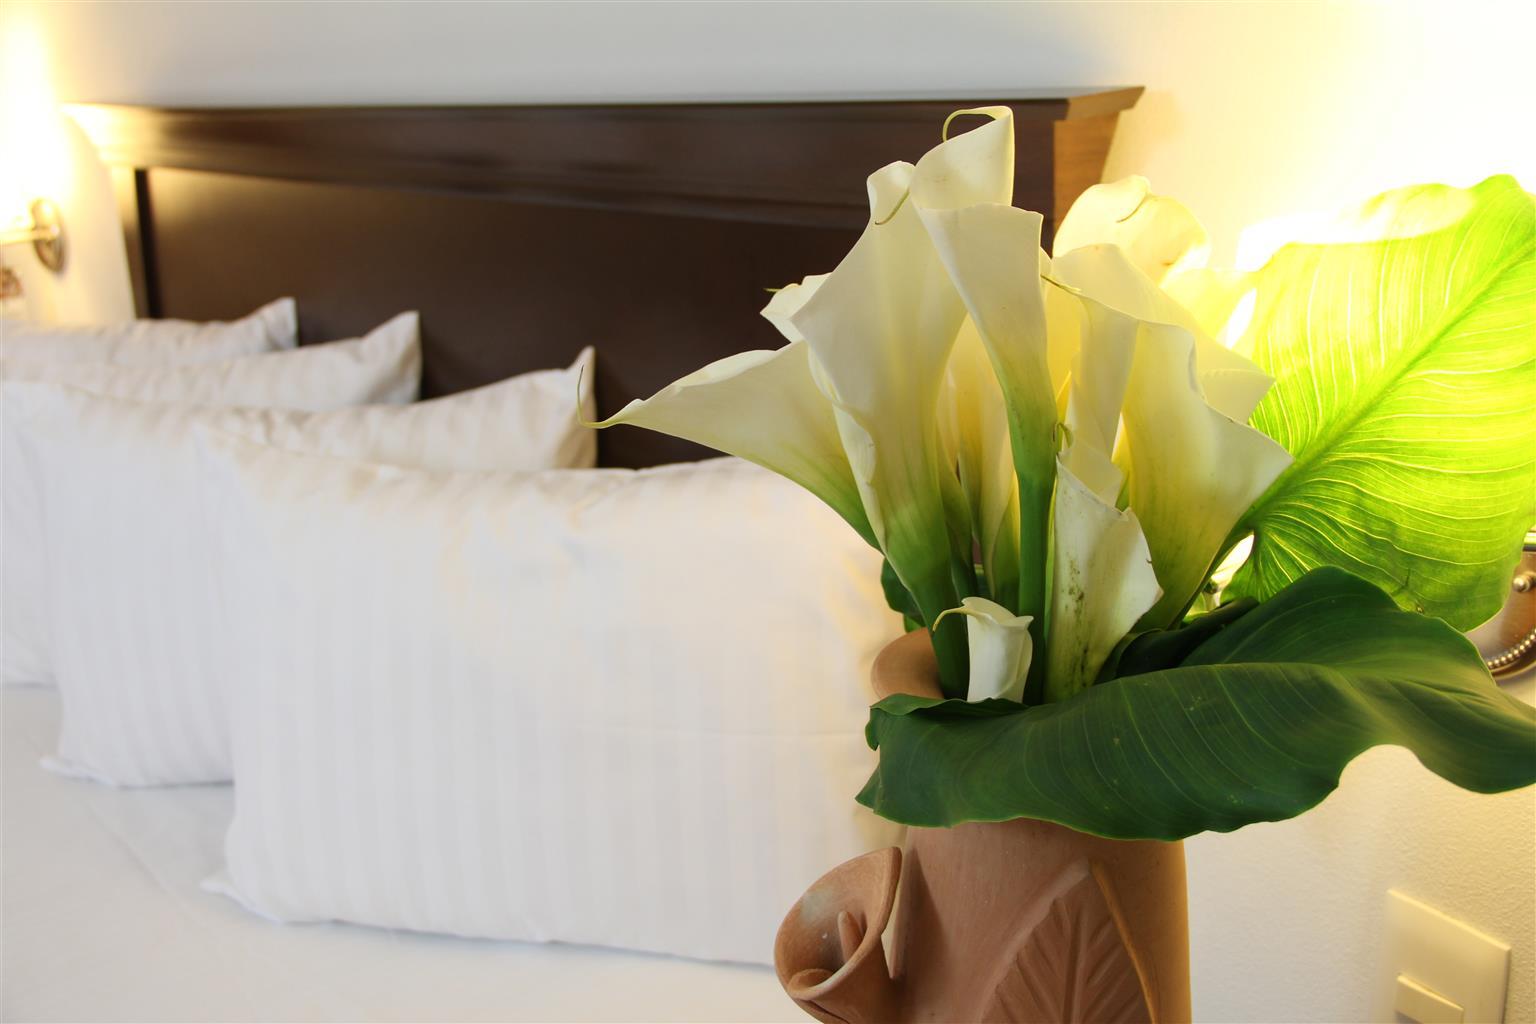 Best western plus flowers hotel best deals amp real reviews -  70127_017_meetingroom 70127_018_meetingroom 70127_019_meetingroom 70127_020_guestroom 70127_021_guestroom 70127_022_guestroom 70127_023_guestroom